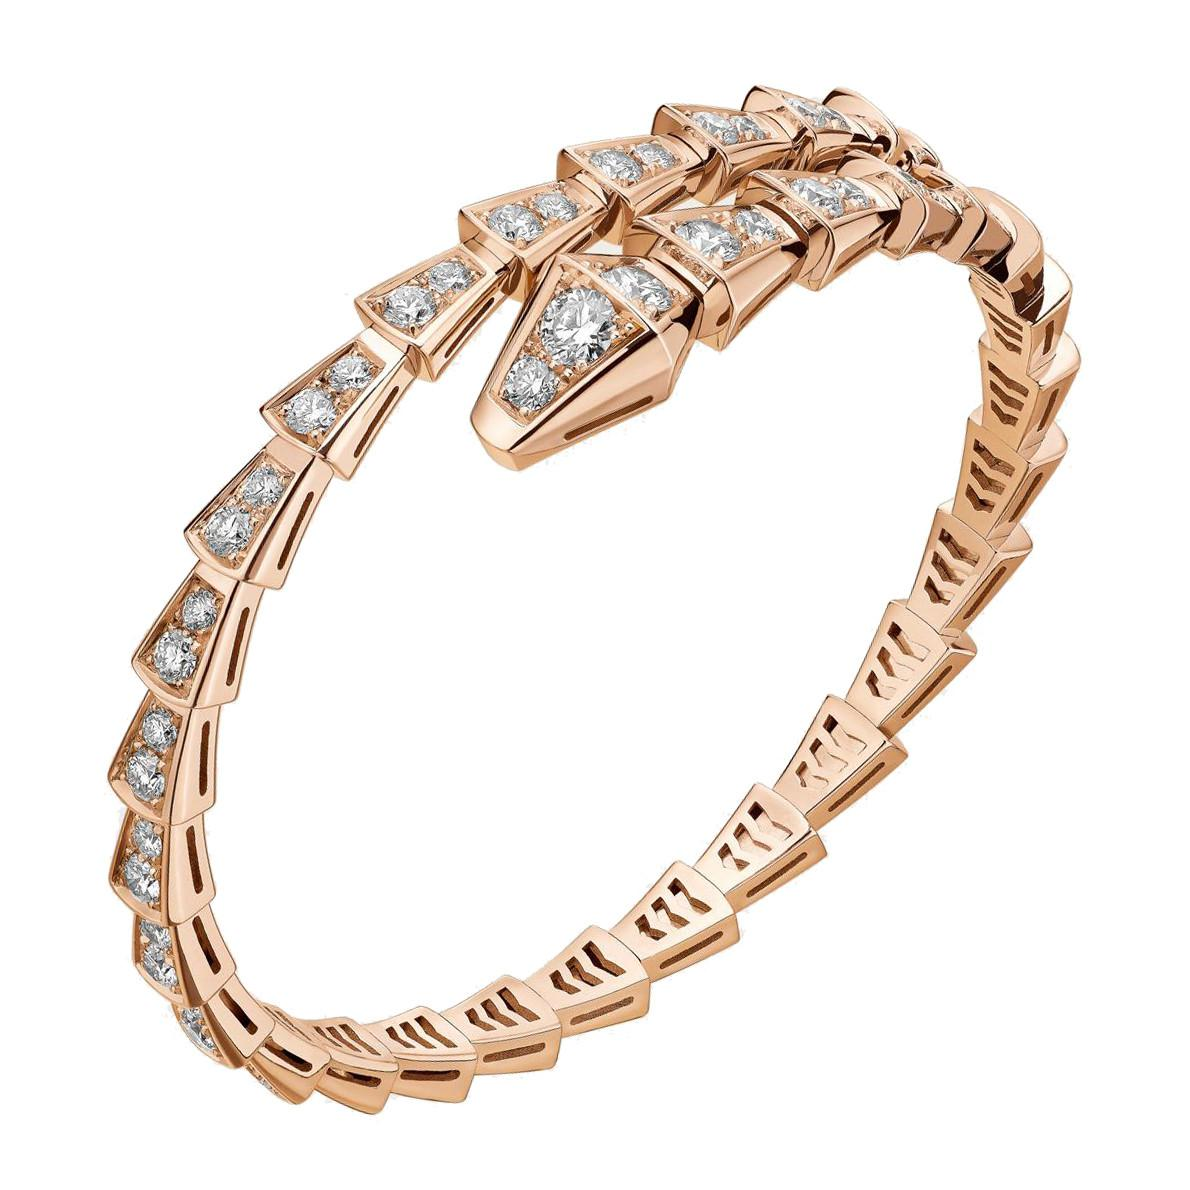 816ade5b888 BVLGARI 18k Rose Gold & Diamond